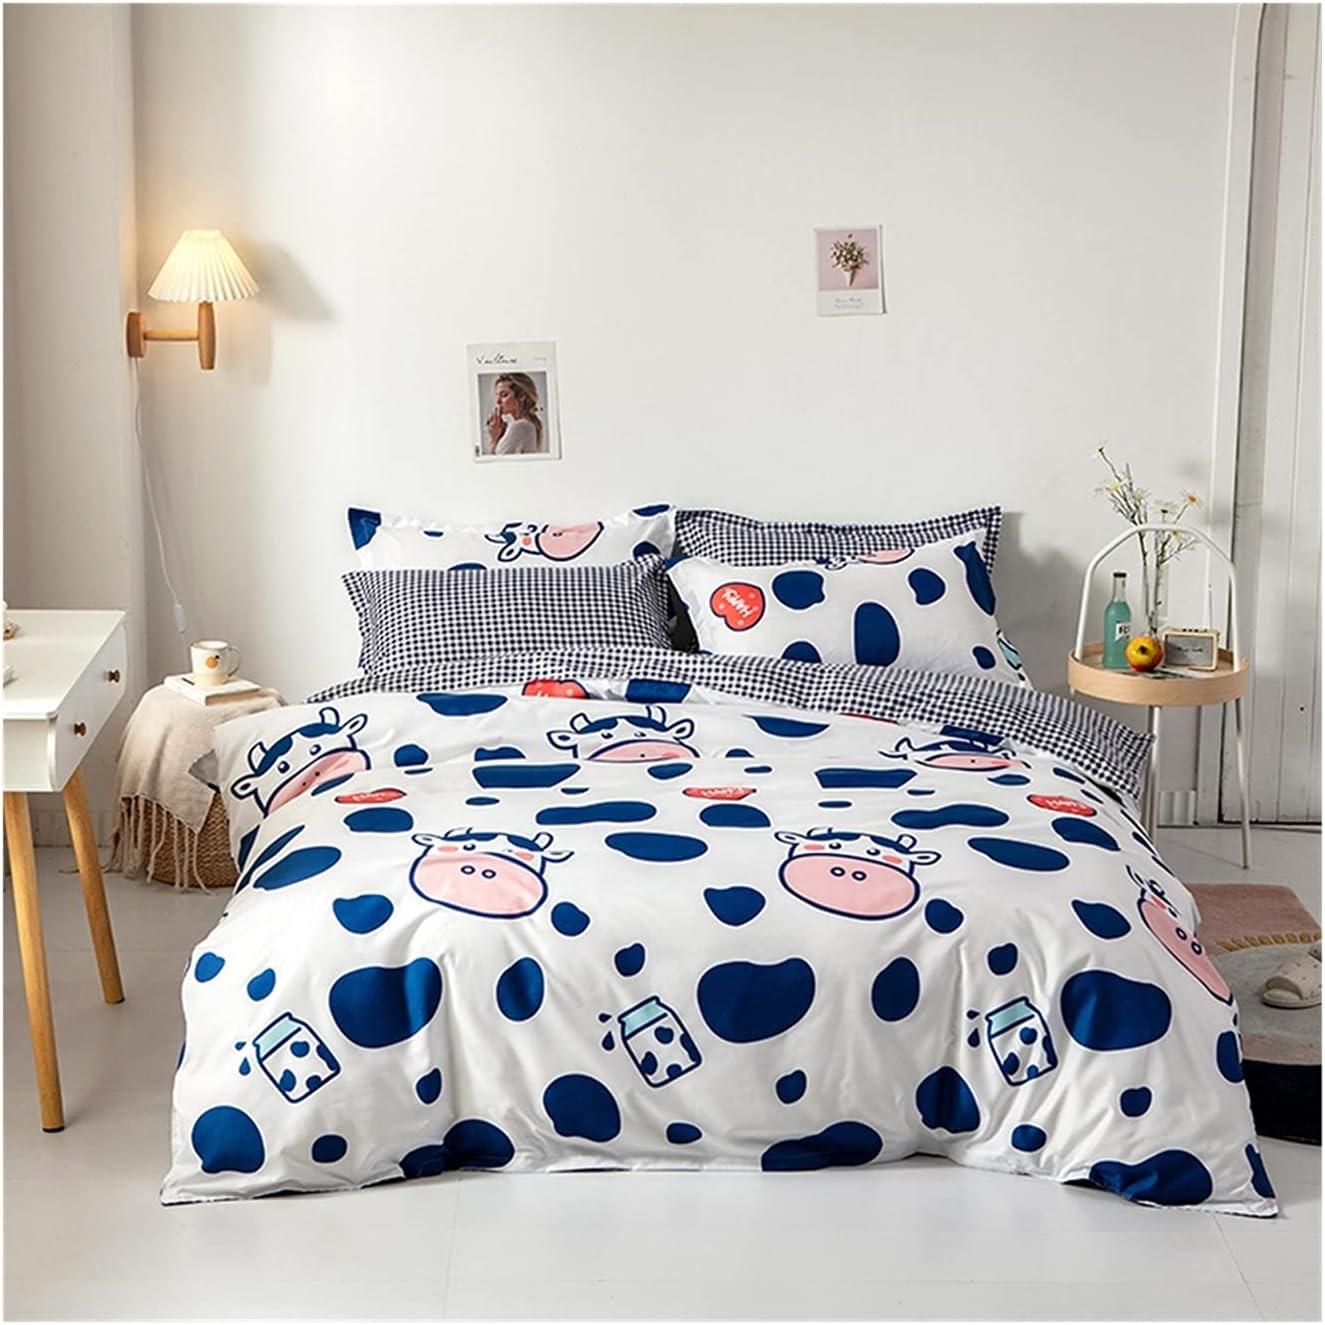 LSDJ QMDSH Home trend rank Textile Girl Bedding Peach New item Duvet Set Cover Pink